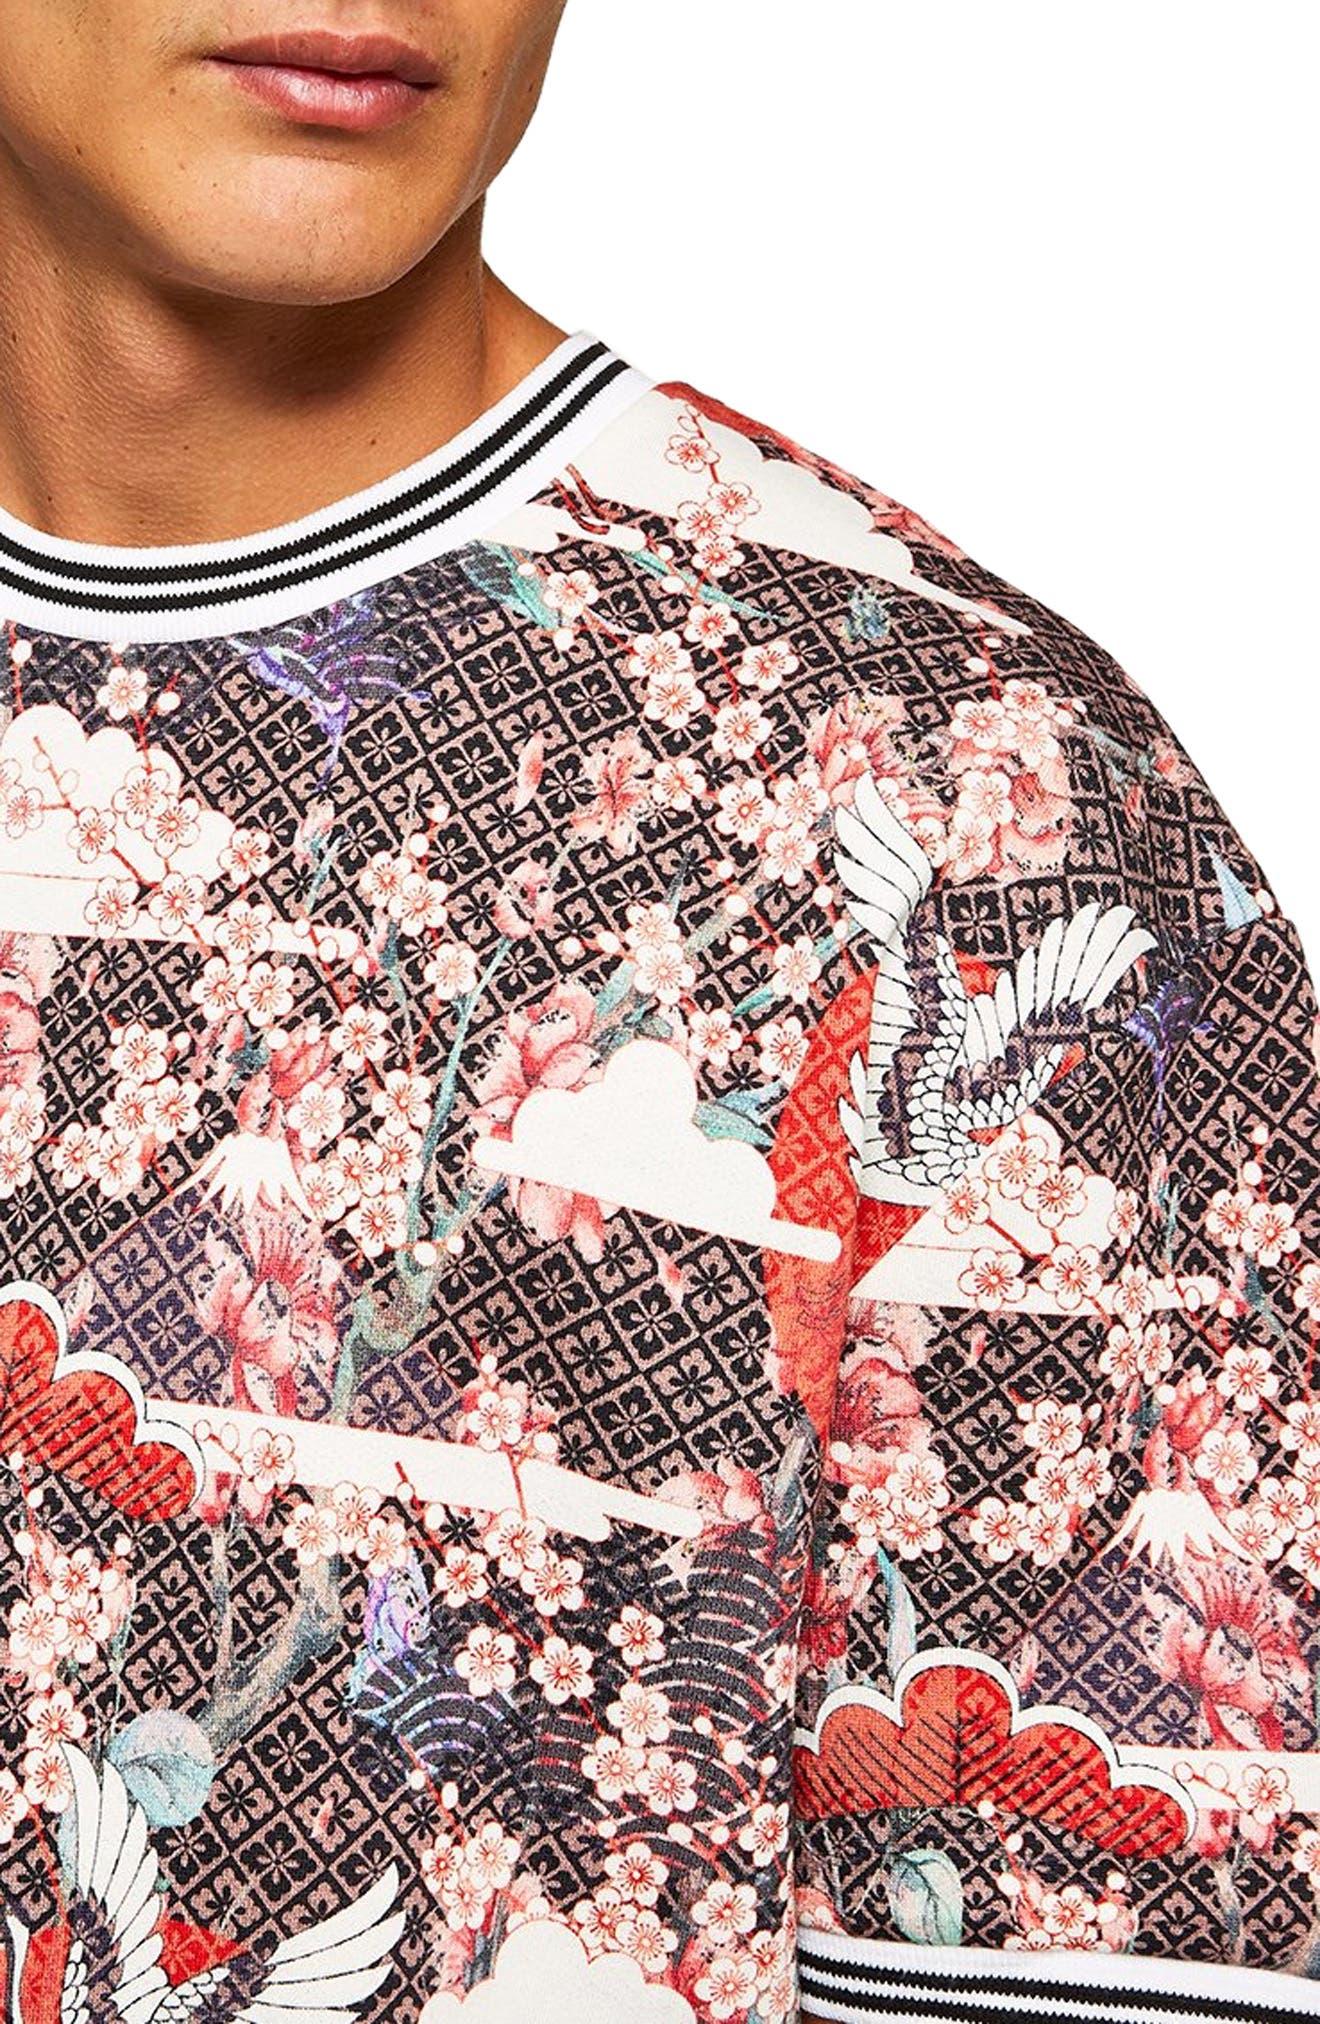 Japanese Tile Print Short Sleeve Sweatshirt,                             Alternate thumbnail 3, color,                             600